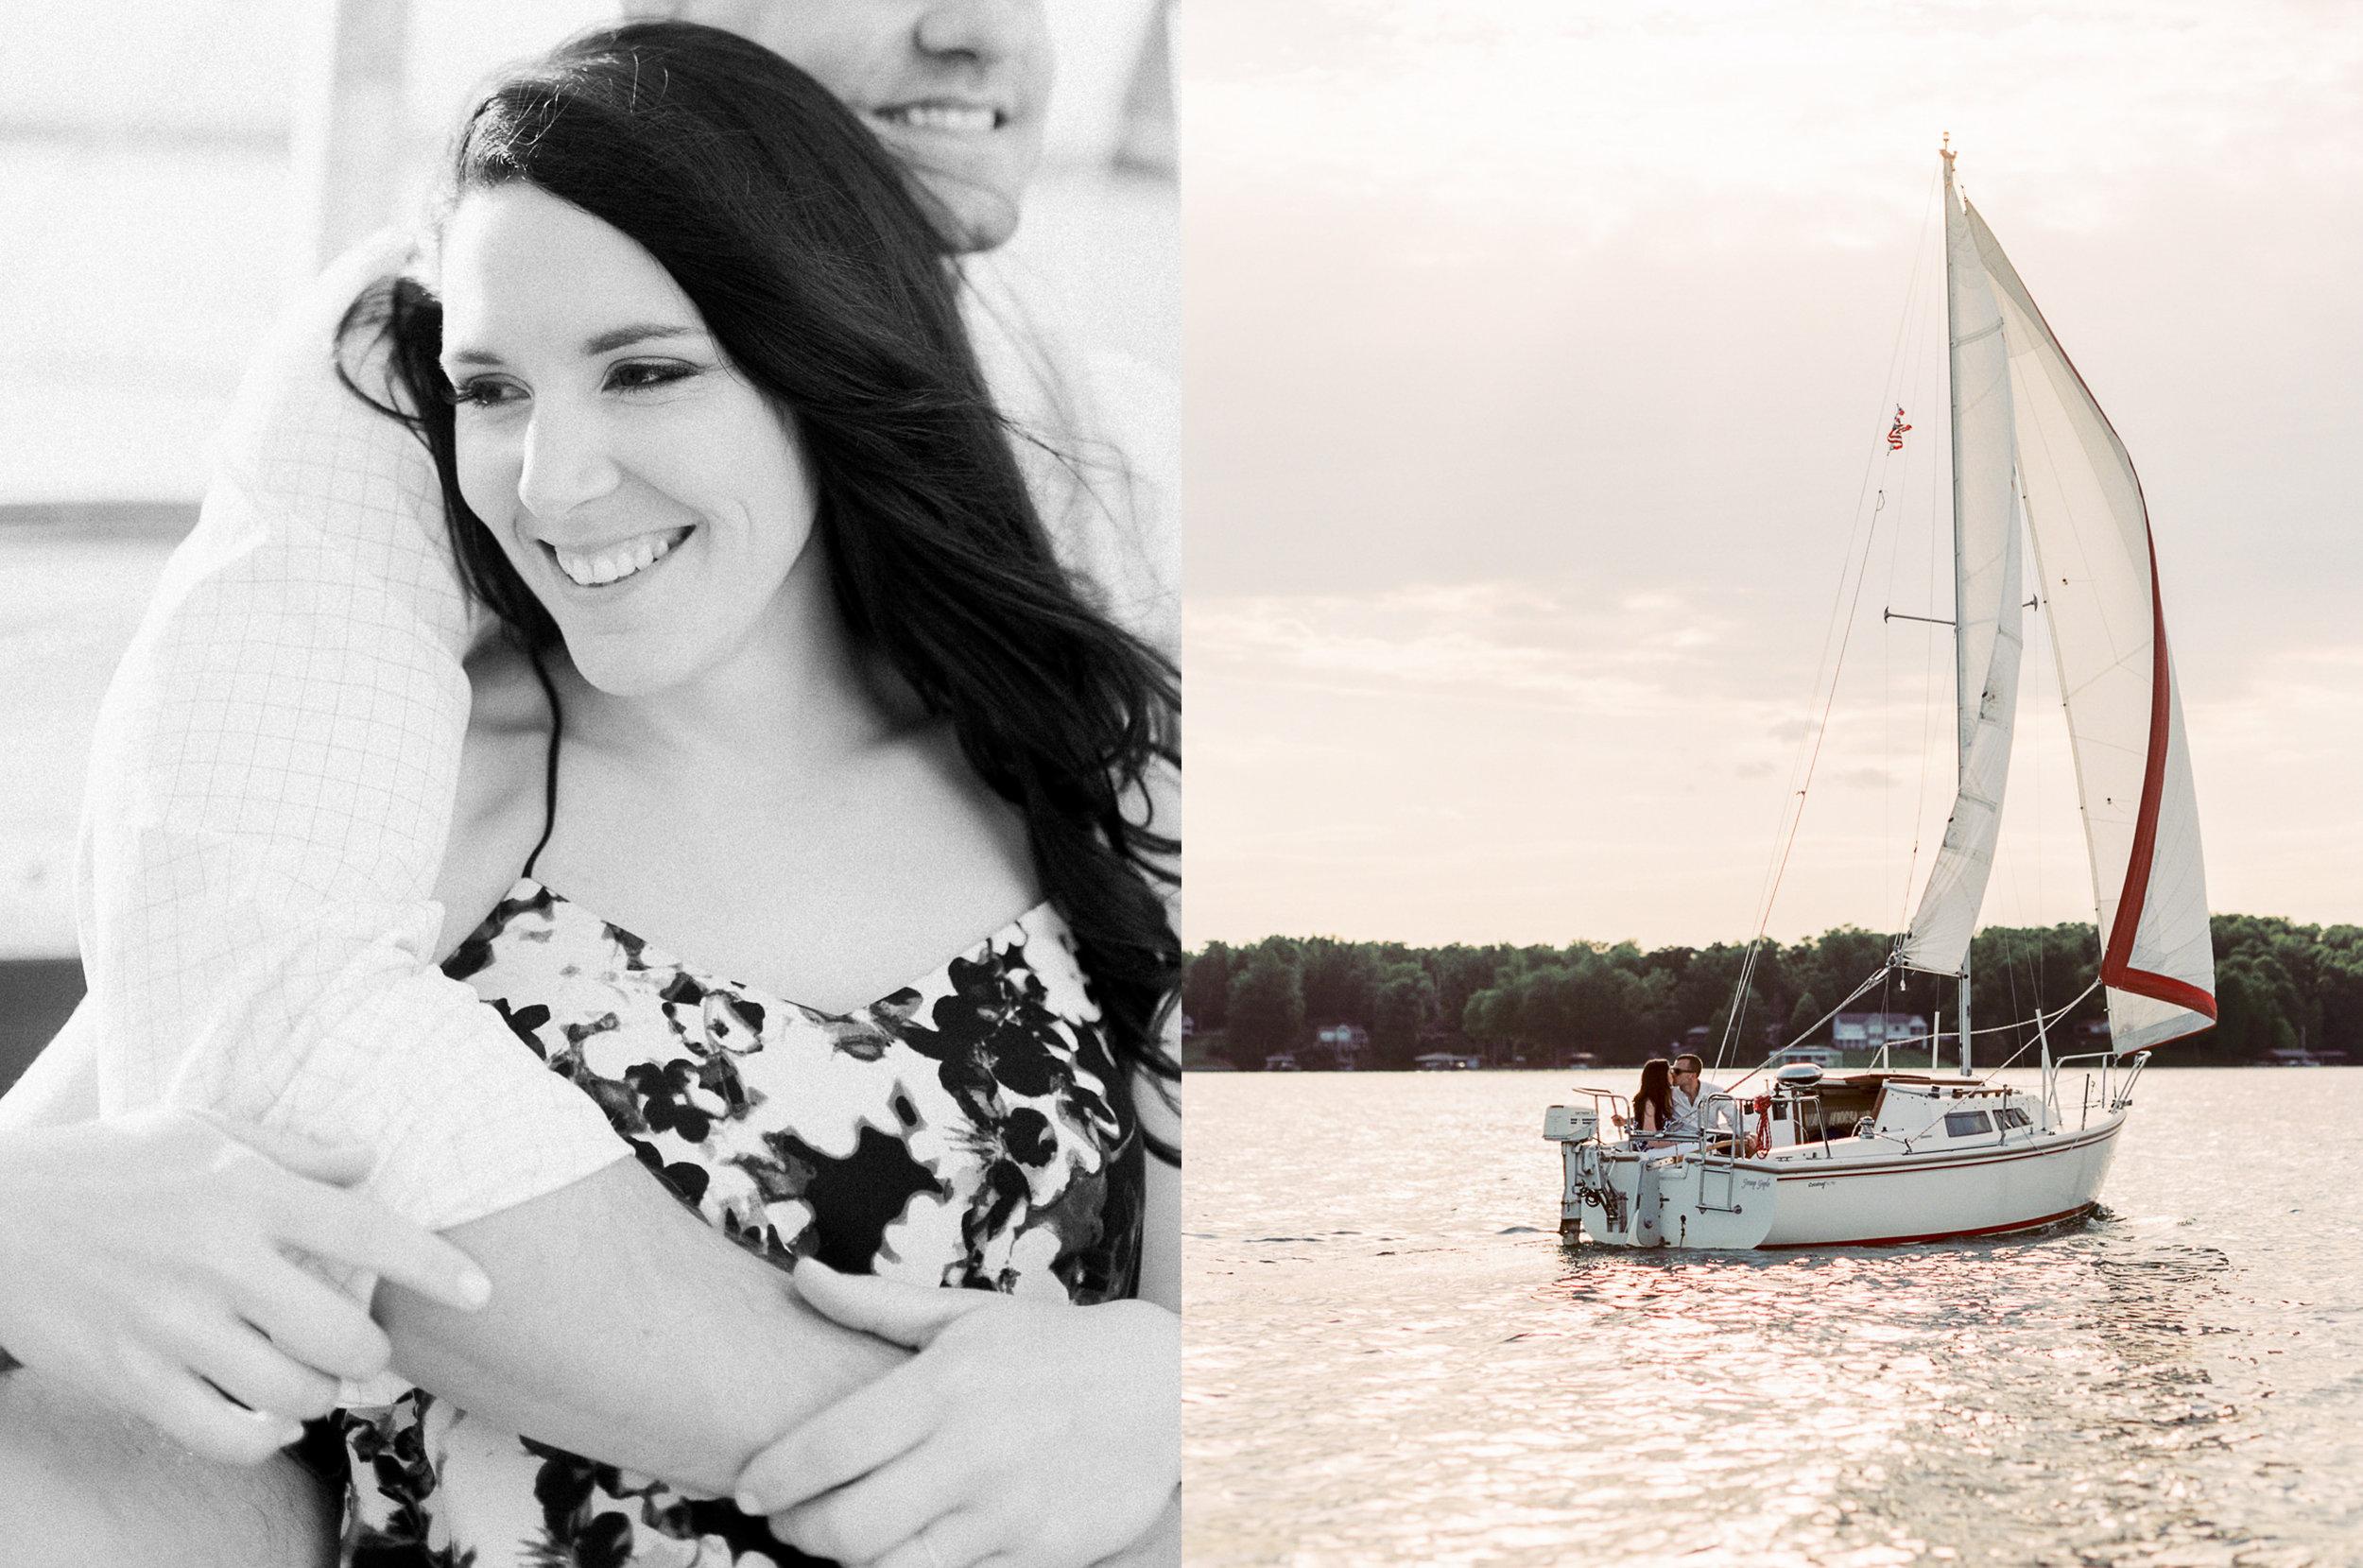 smith-mountain-lake-sailboat-engagement-session-charlotte-sailing-photographer-20.jpg